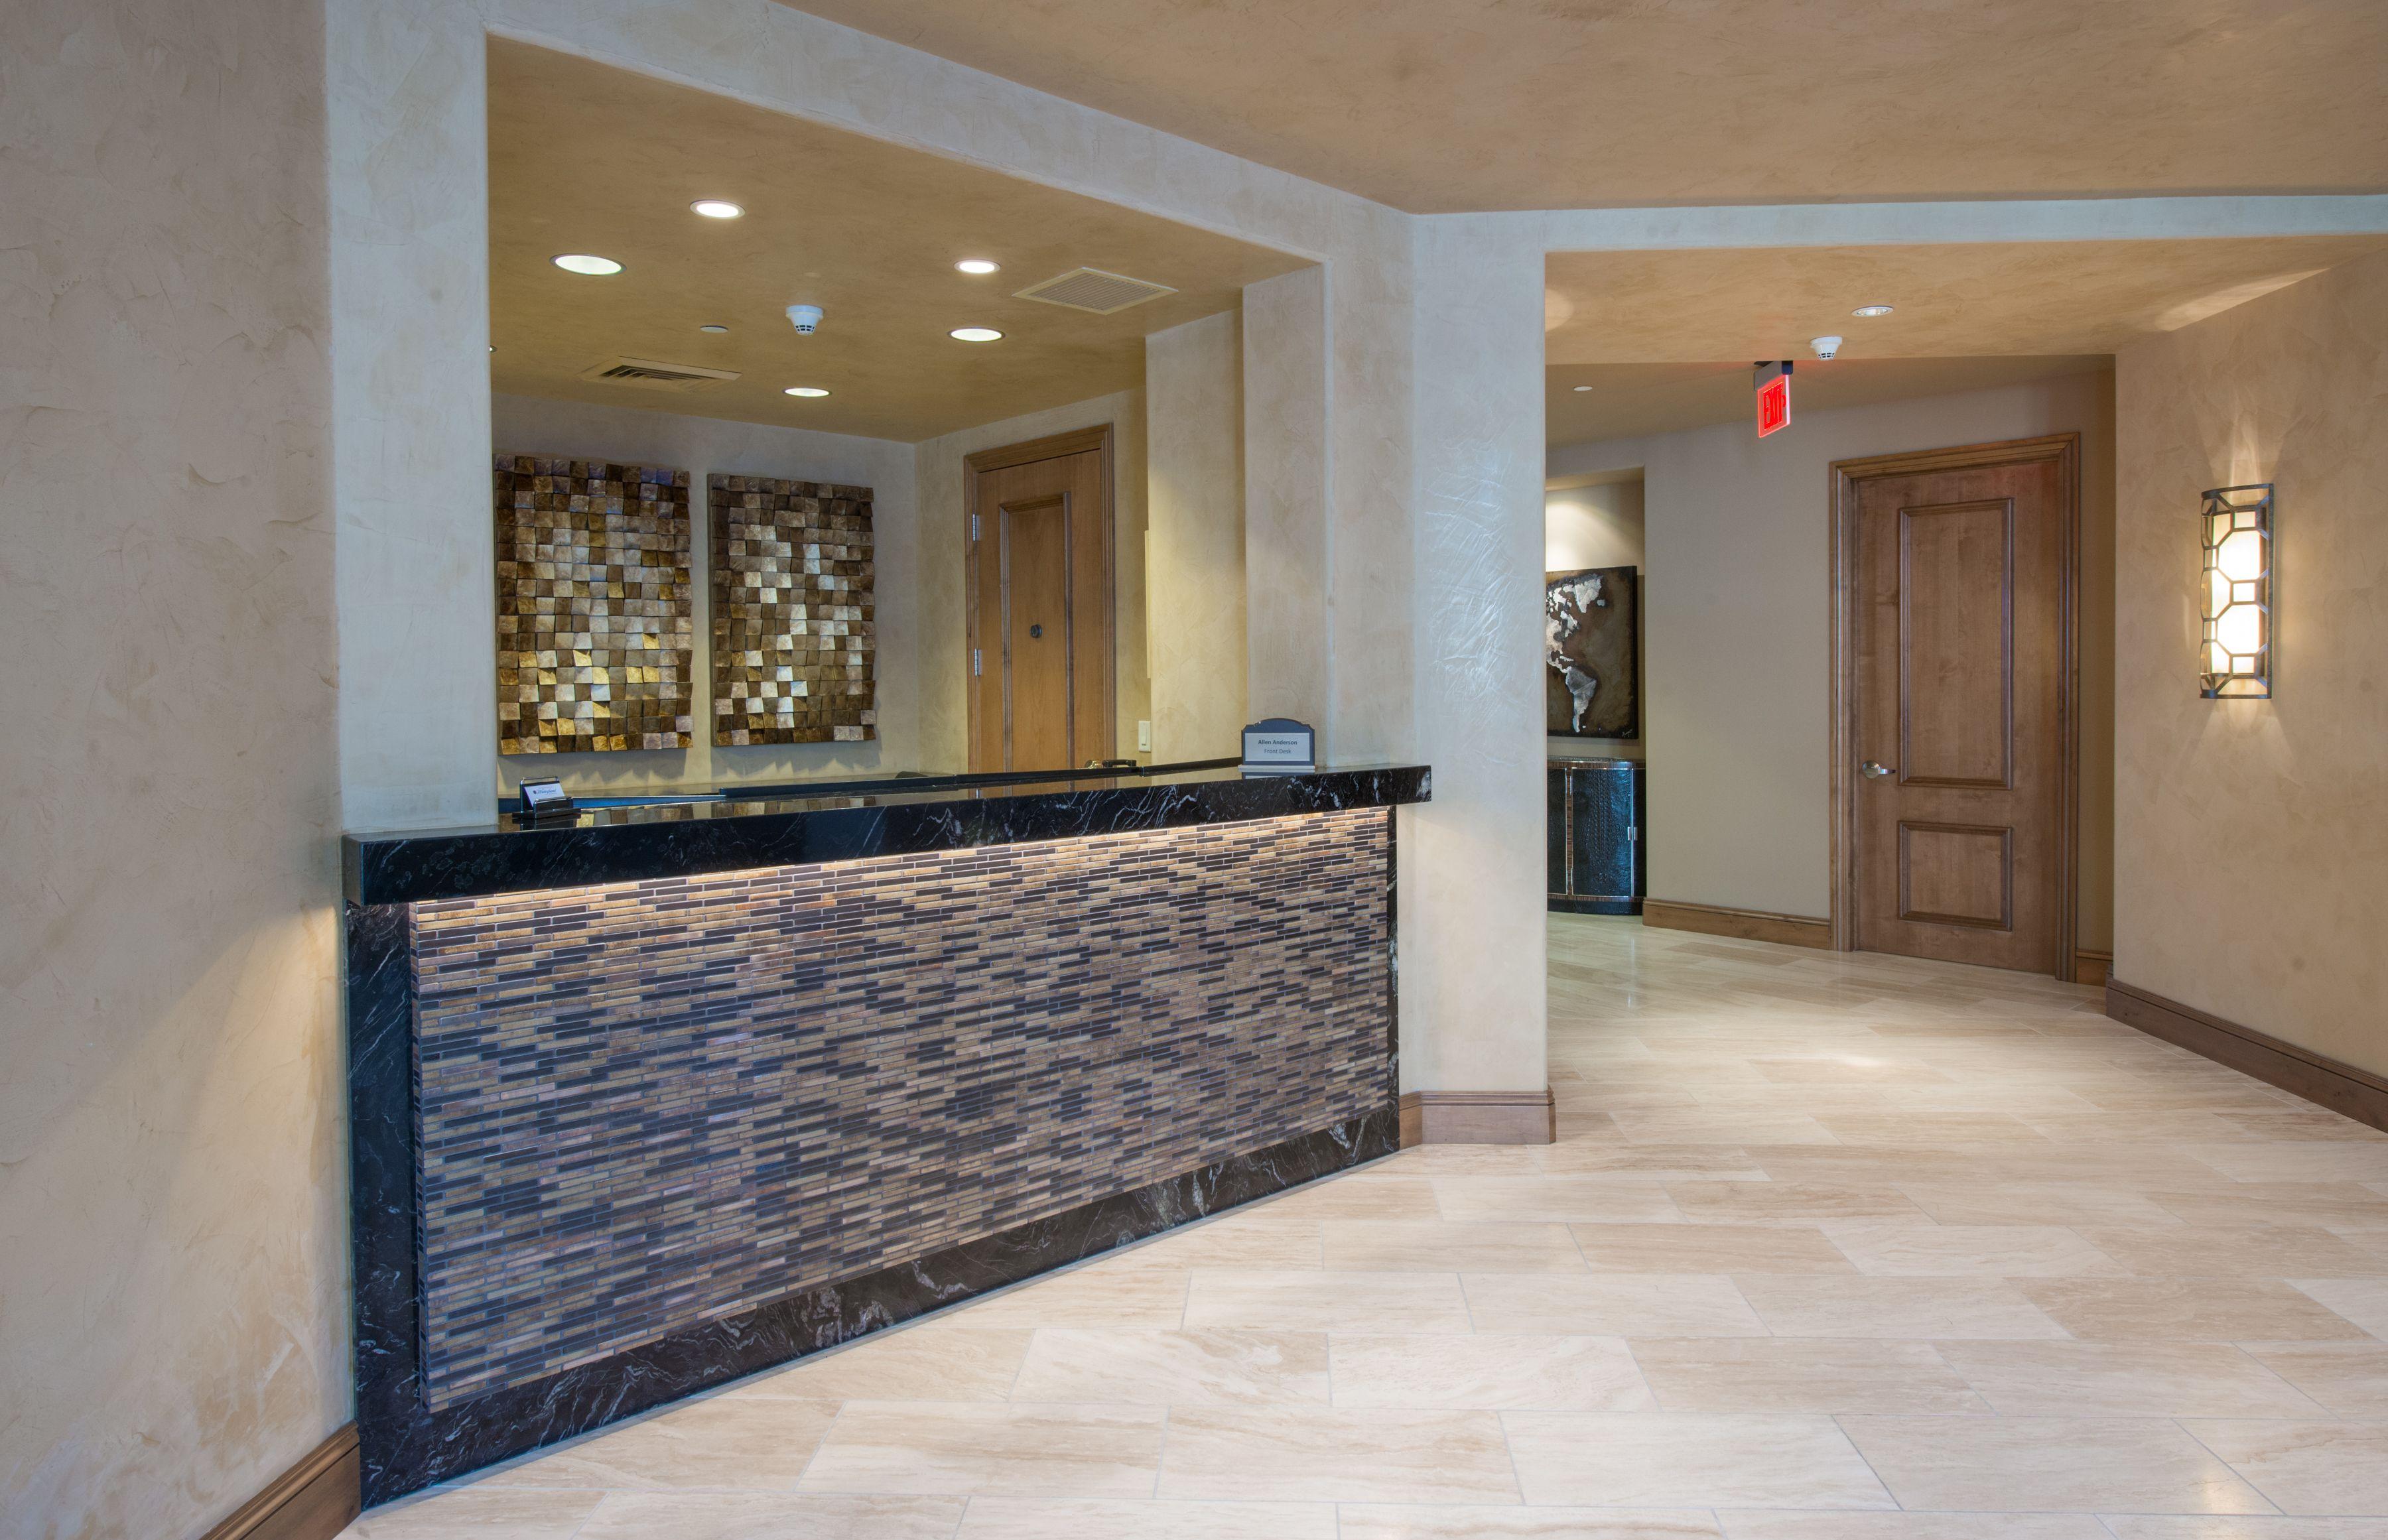 Stone Turning Marble Floor Lobby : The lobby hallway of this high end condominium residence